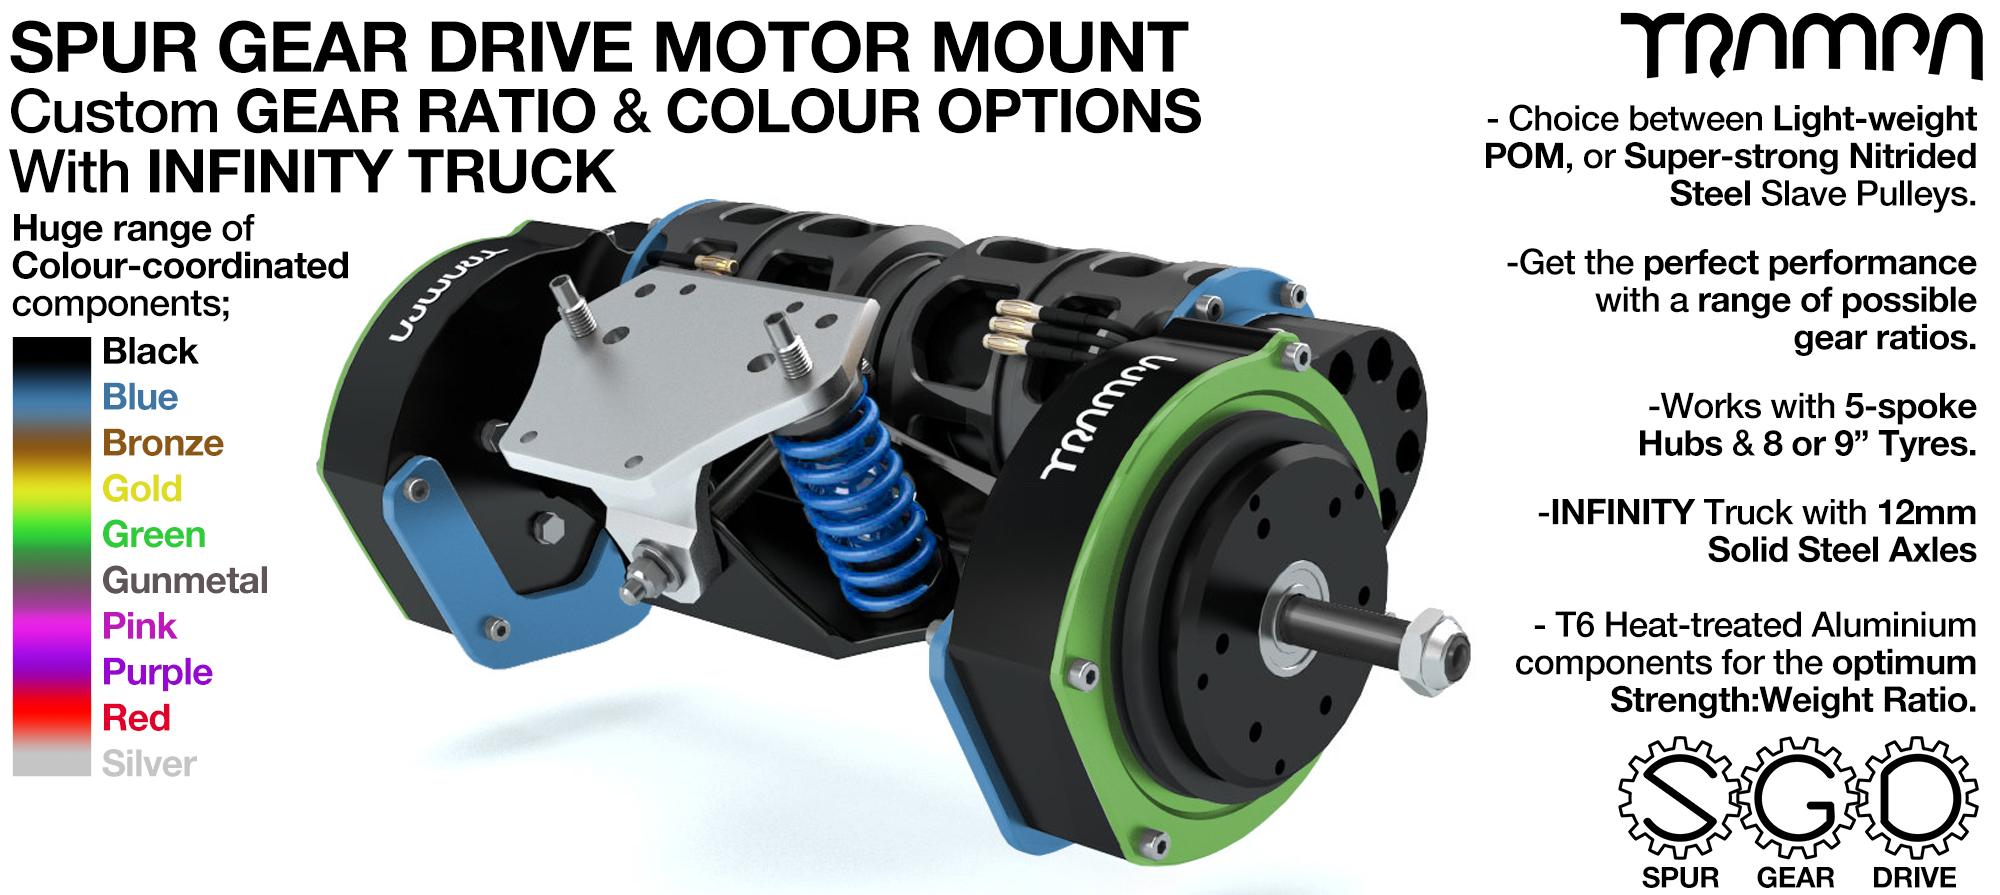 Mountainboard Spur Gear Drive TWIN Motor Mount with Motors & INFINITY Truck